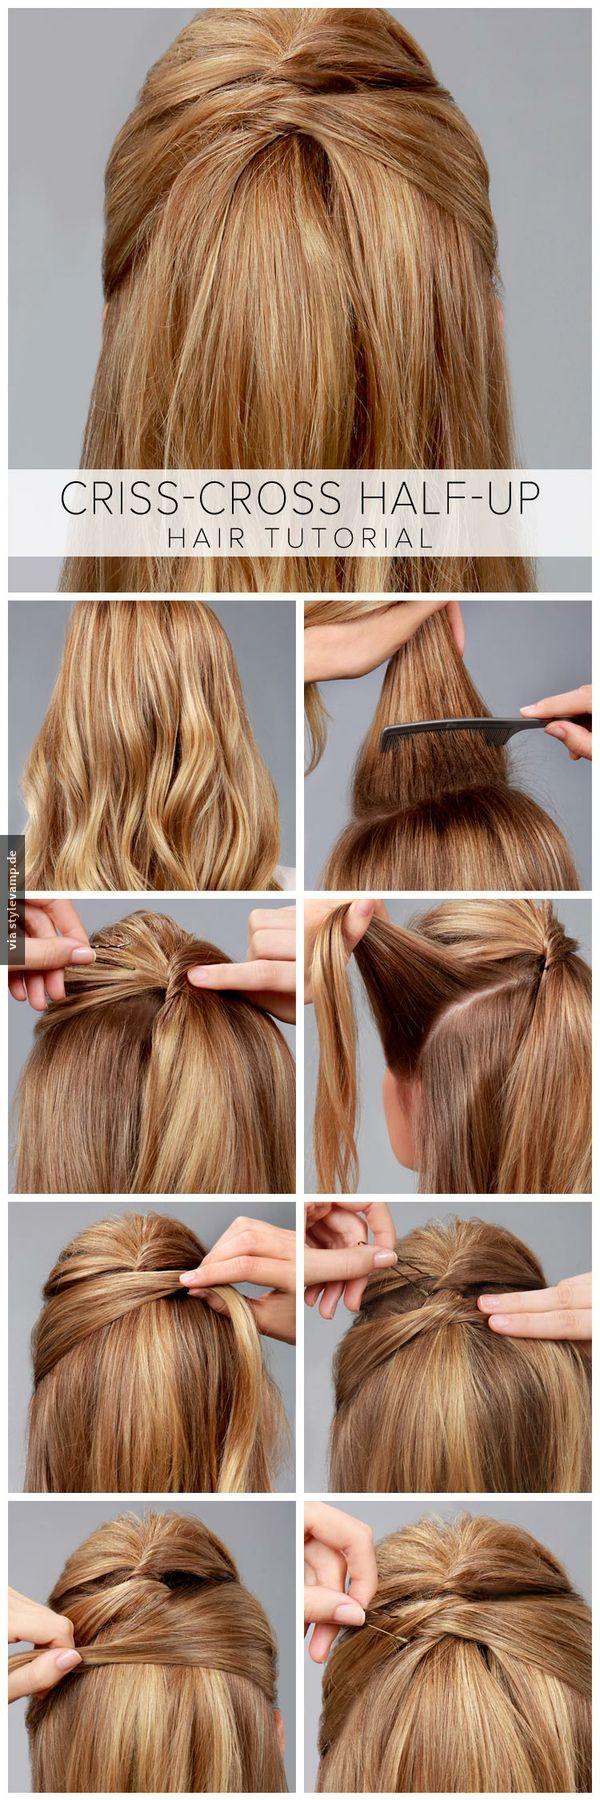 Special Hair Tutorial